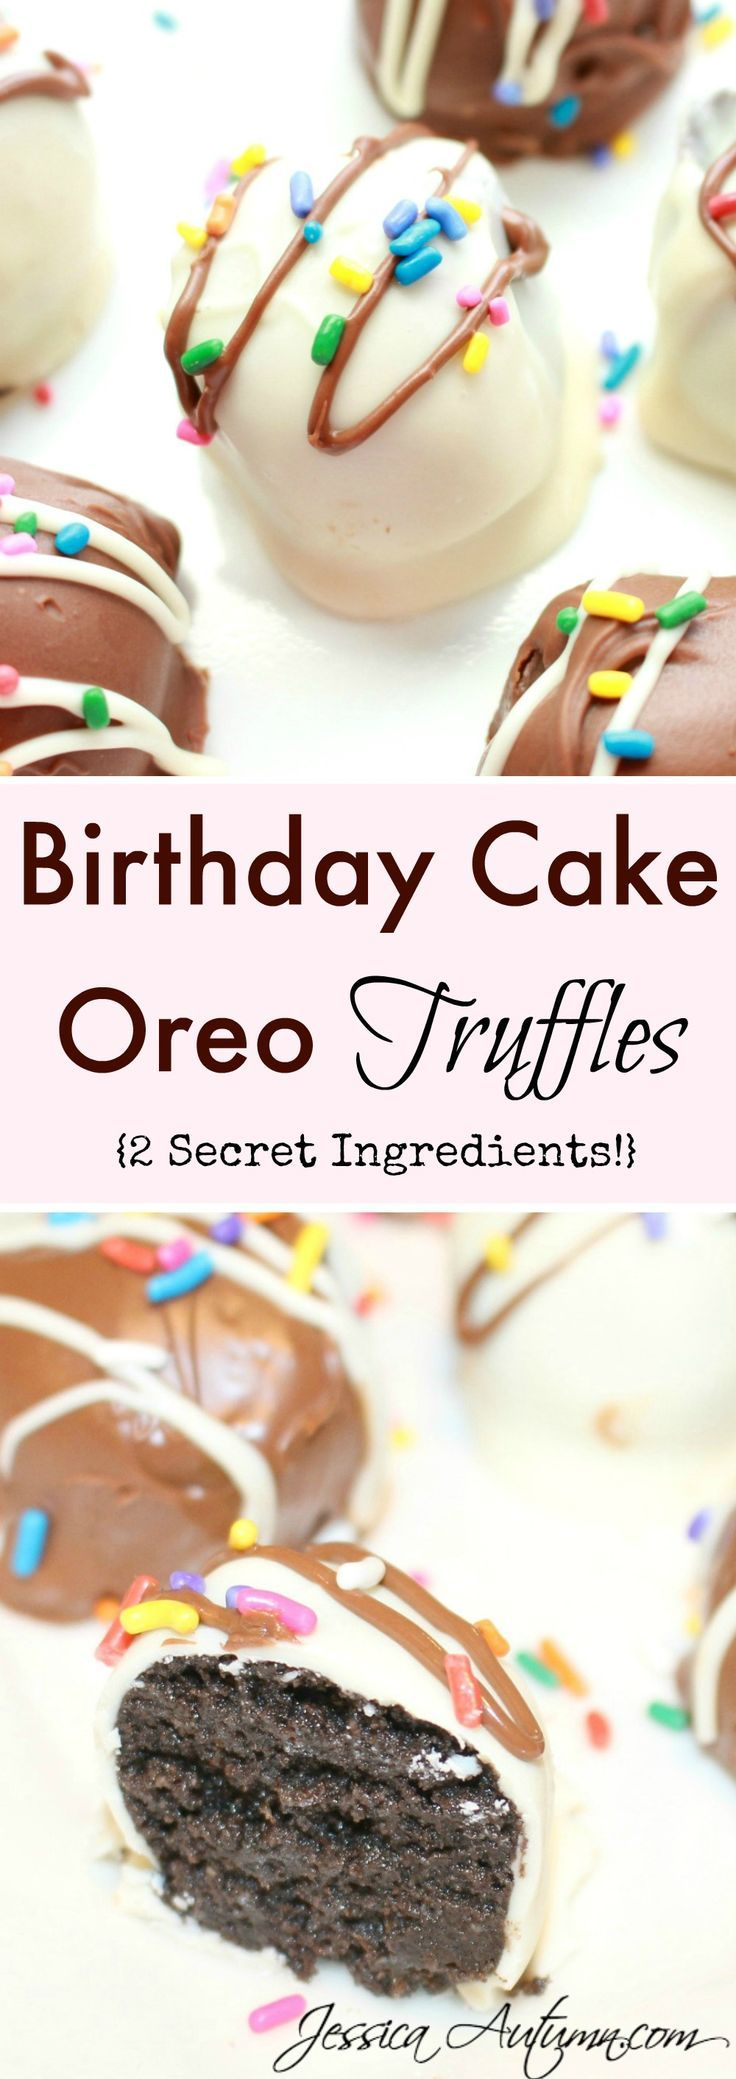 Birthday Cake Oreos Ingredients